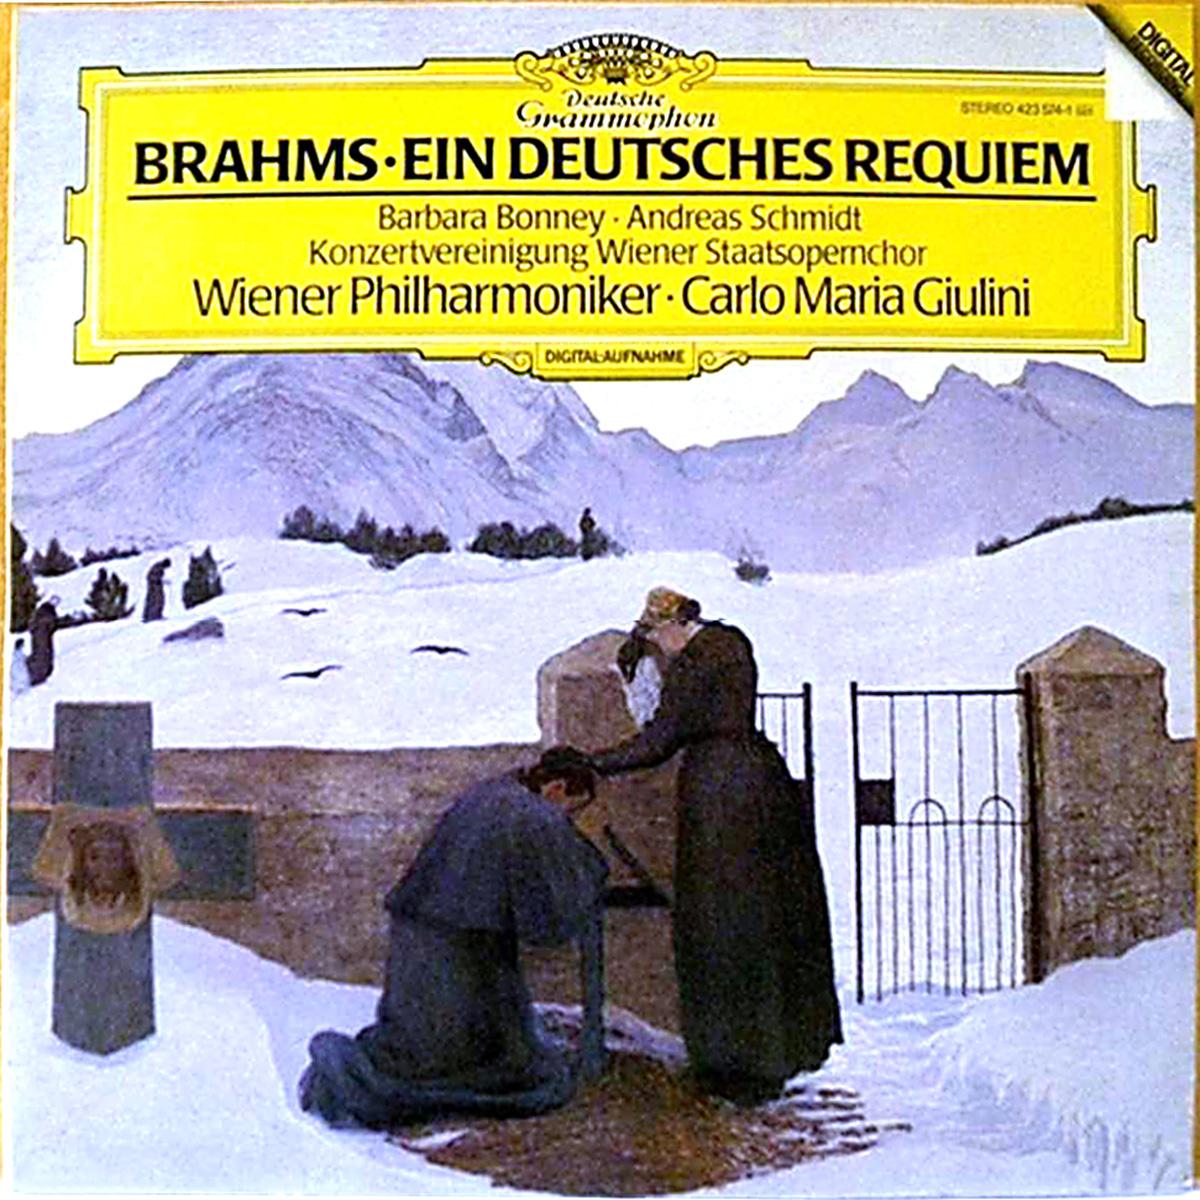 DGG 423 574 Brahms Deutsches Requiem Giulini DGG Digital Aufnahme